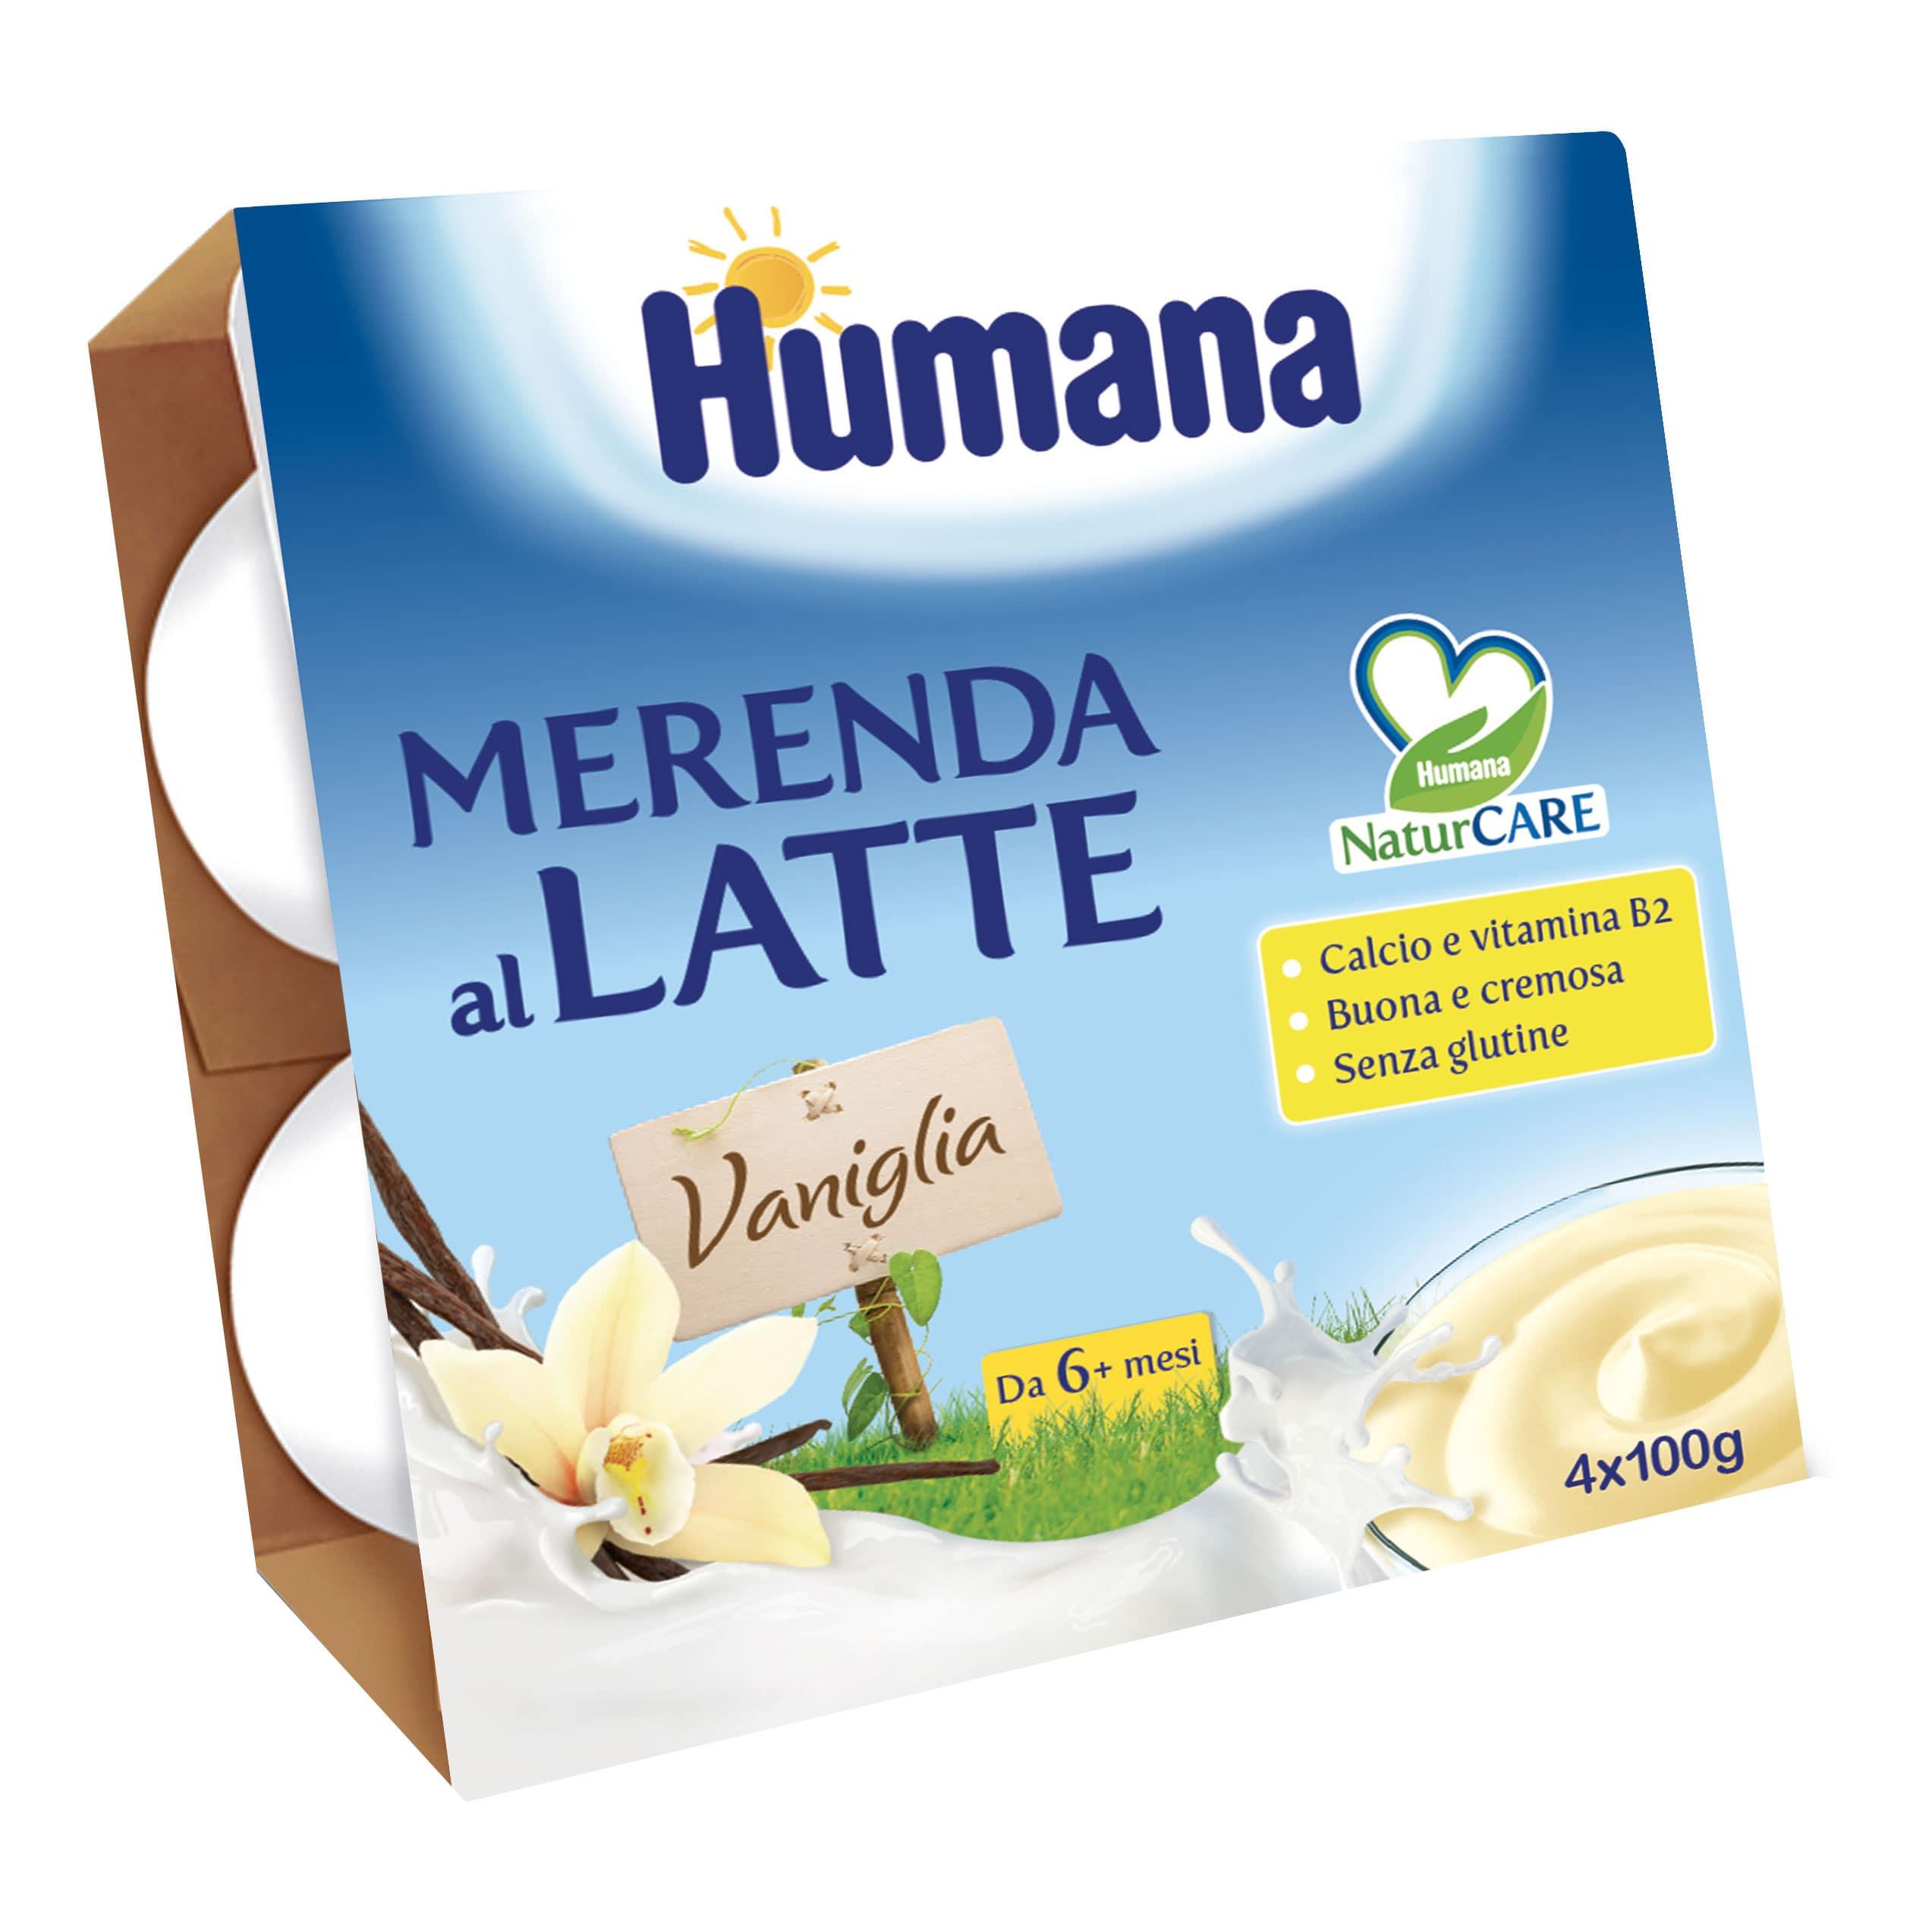 Merenda al Latte Humana - Vaniglia